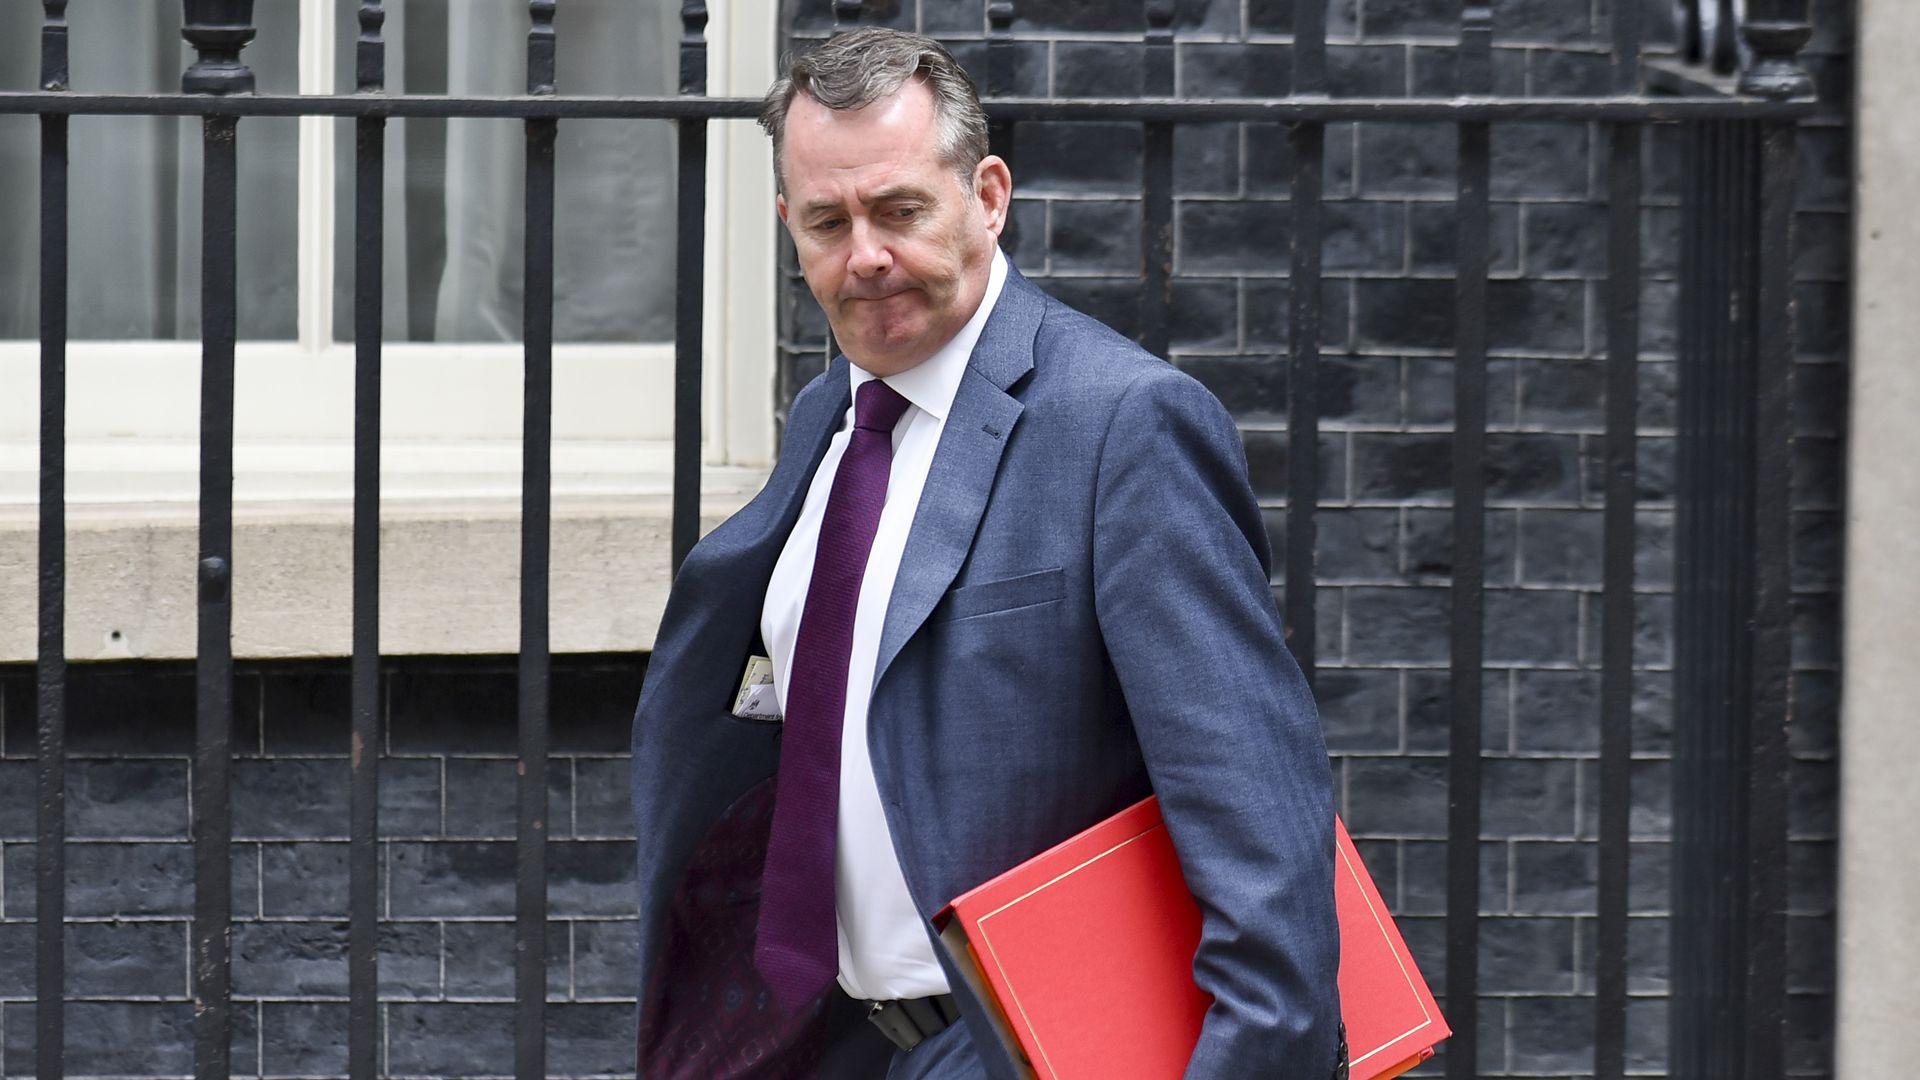 Britain's International Trade Secretary Liam Fox. Photo: Alberto Pezzali/NurPhoto via Getty Images